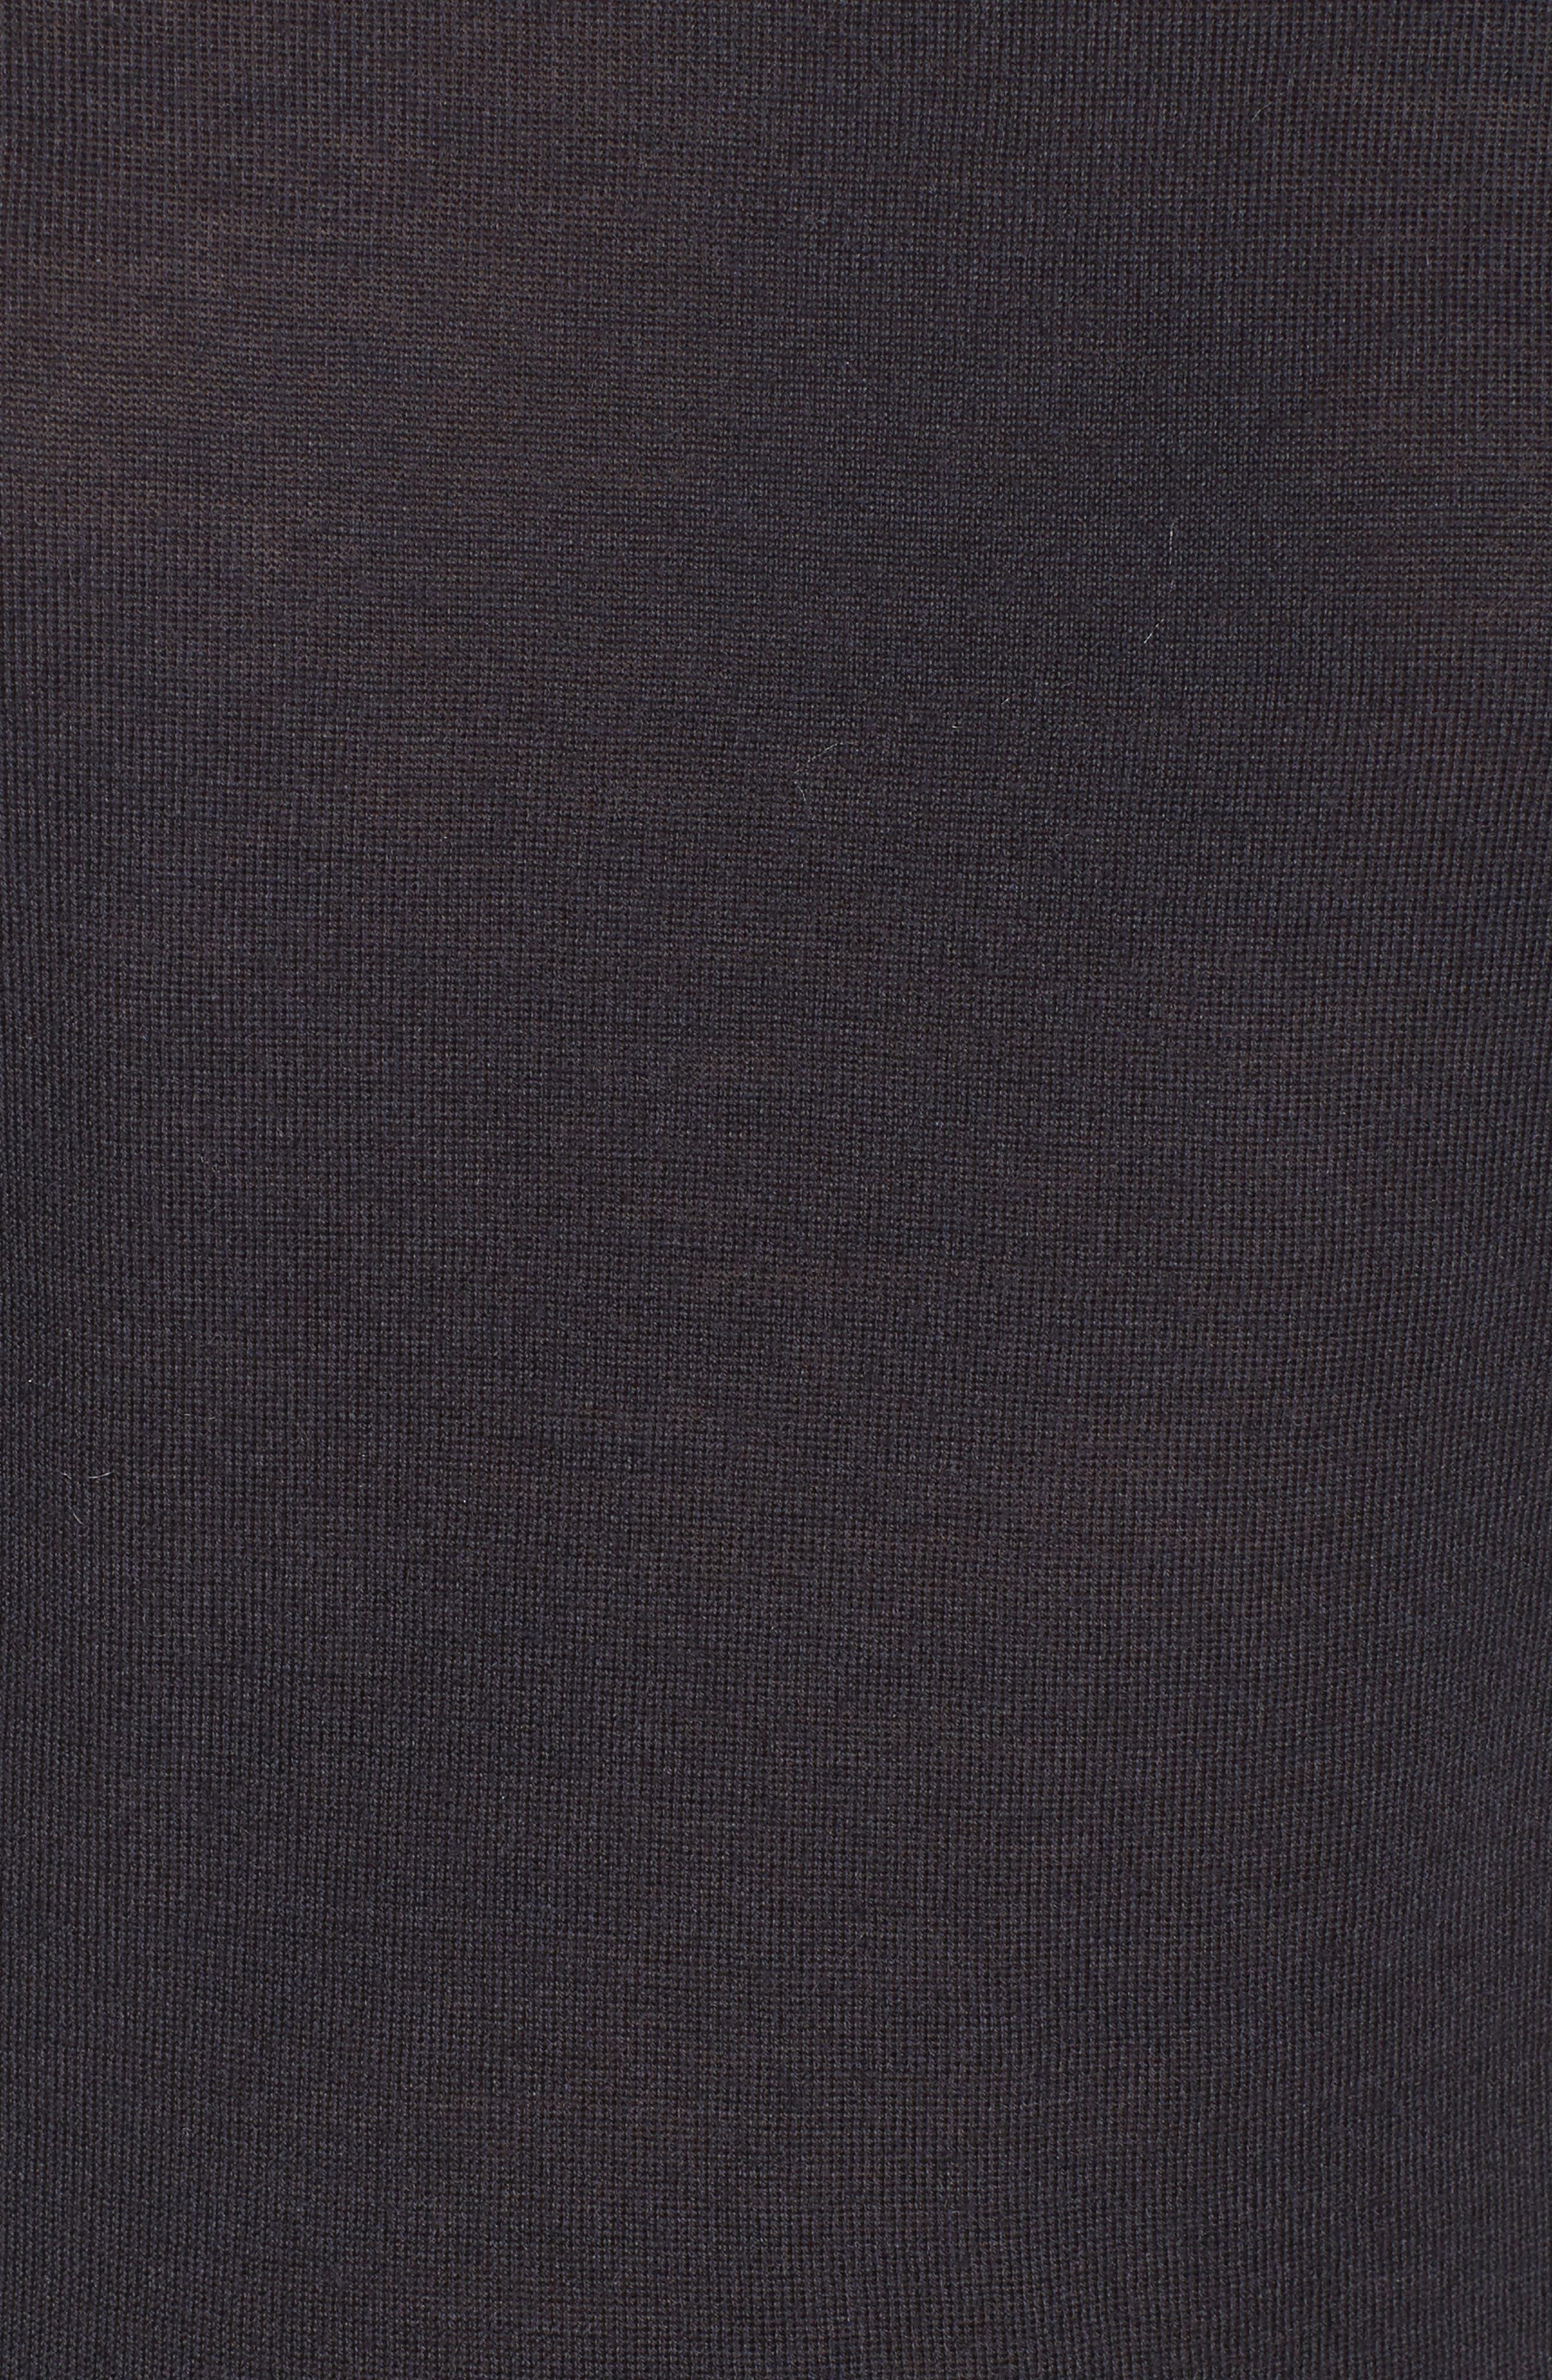 Alternate Image 5  - BOSS Fifet Sparkle Trim Sweater